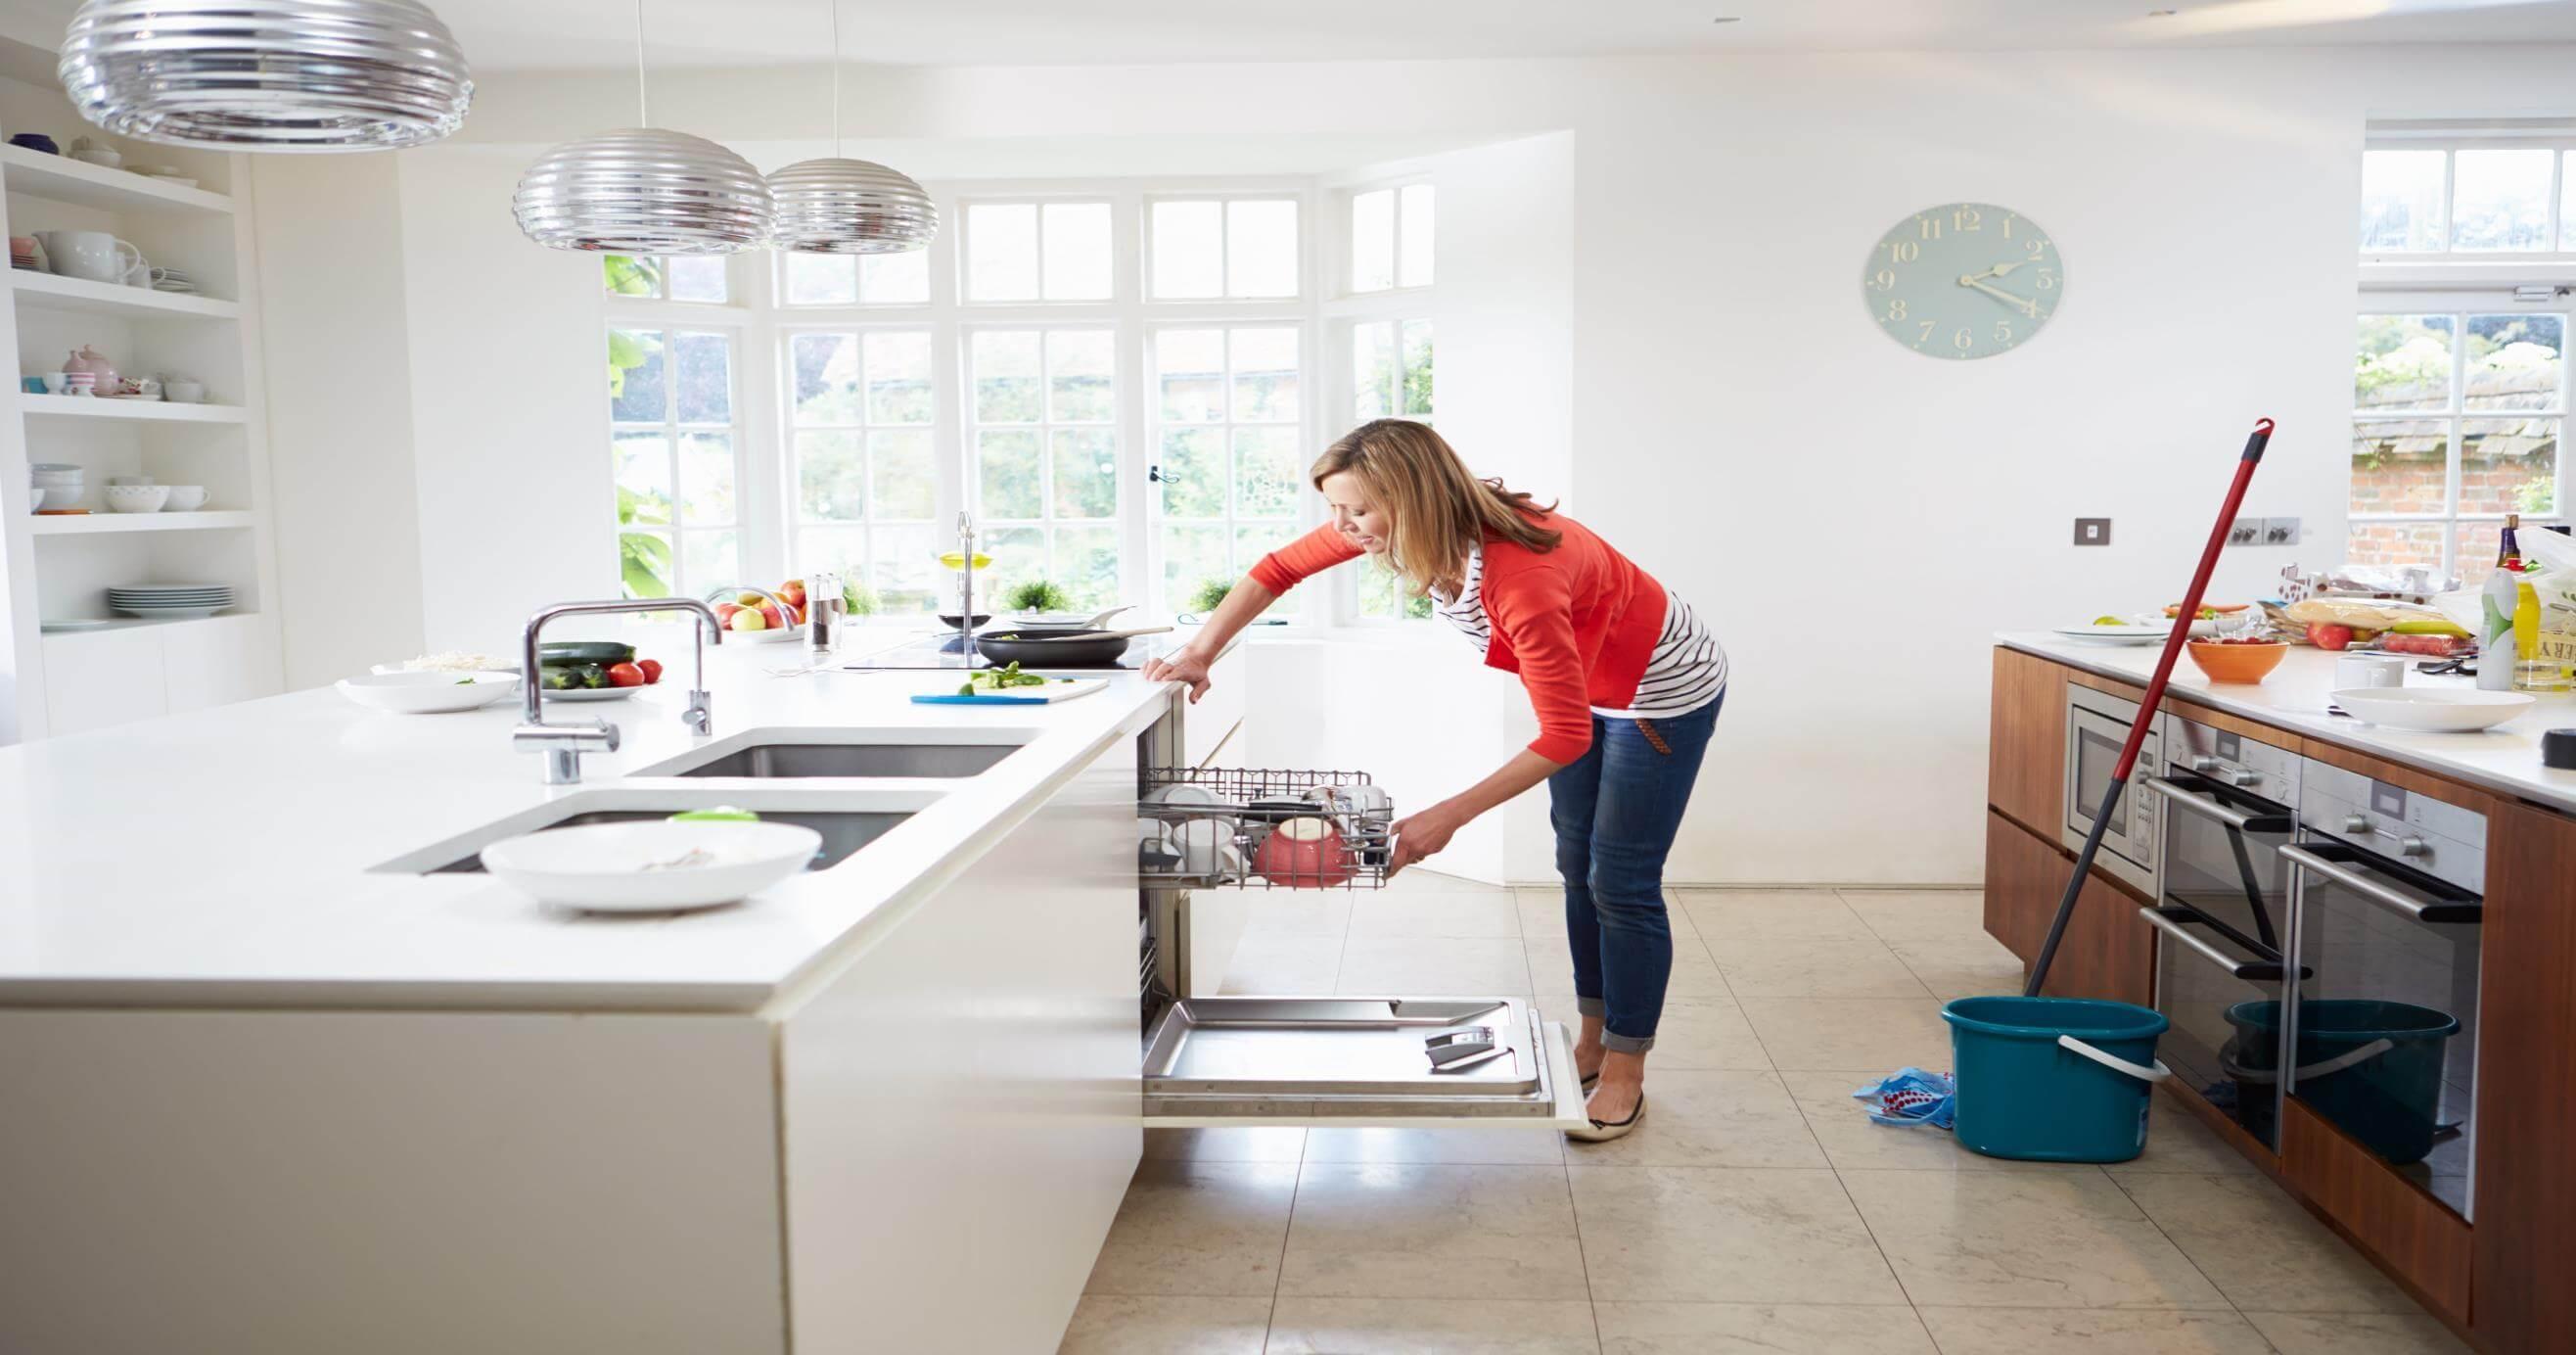 Fix Dishwasher